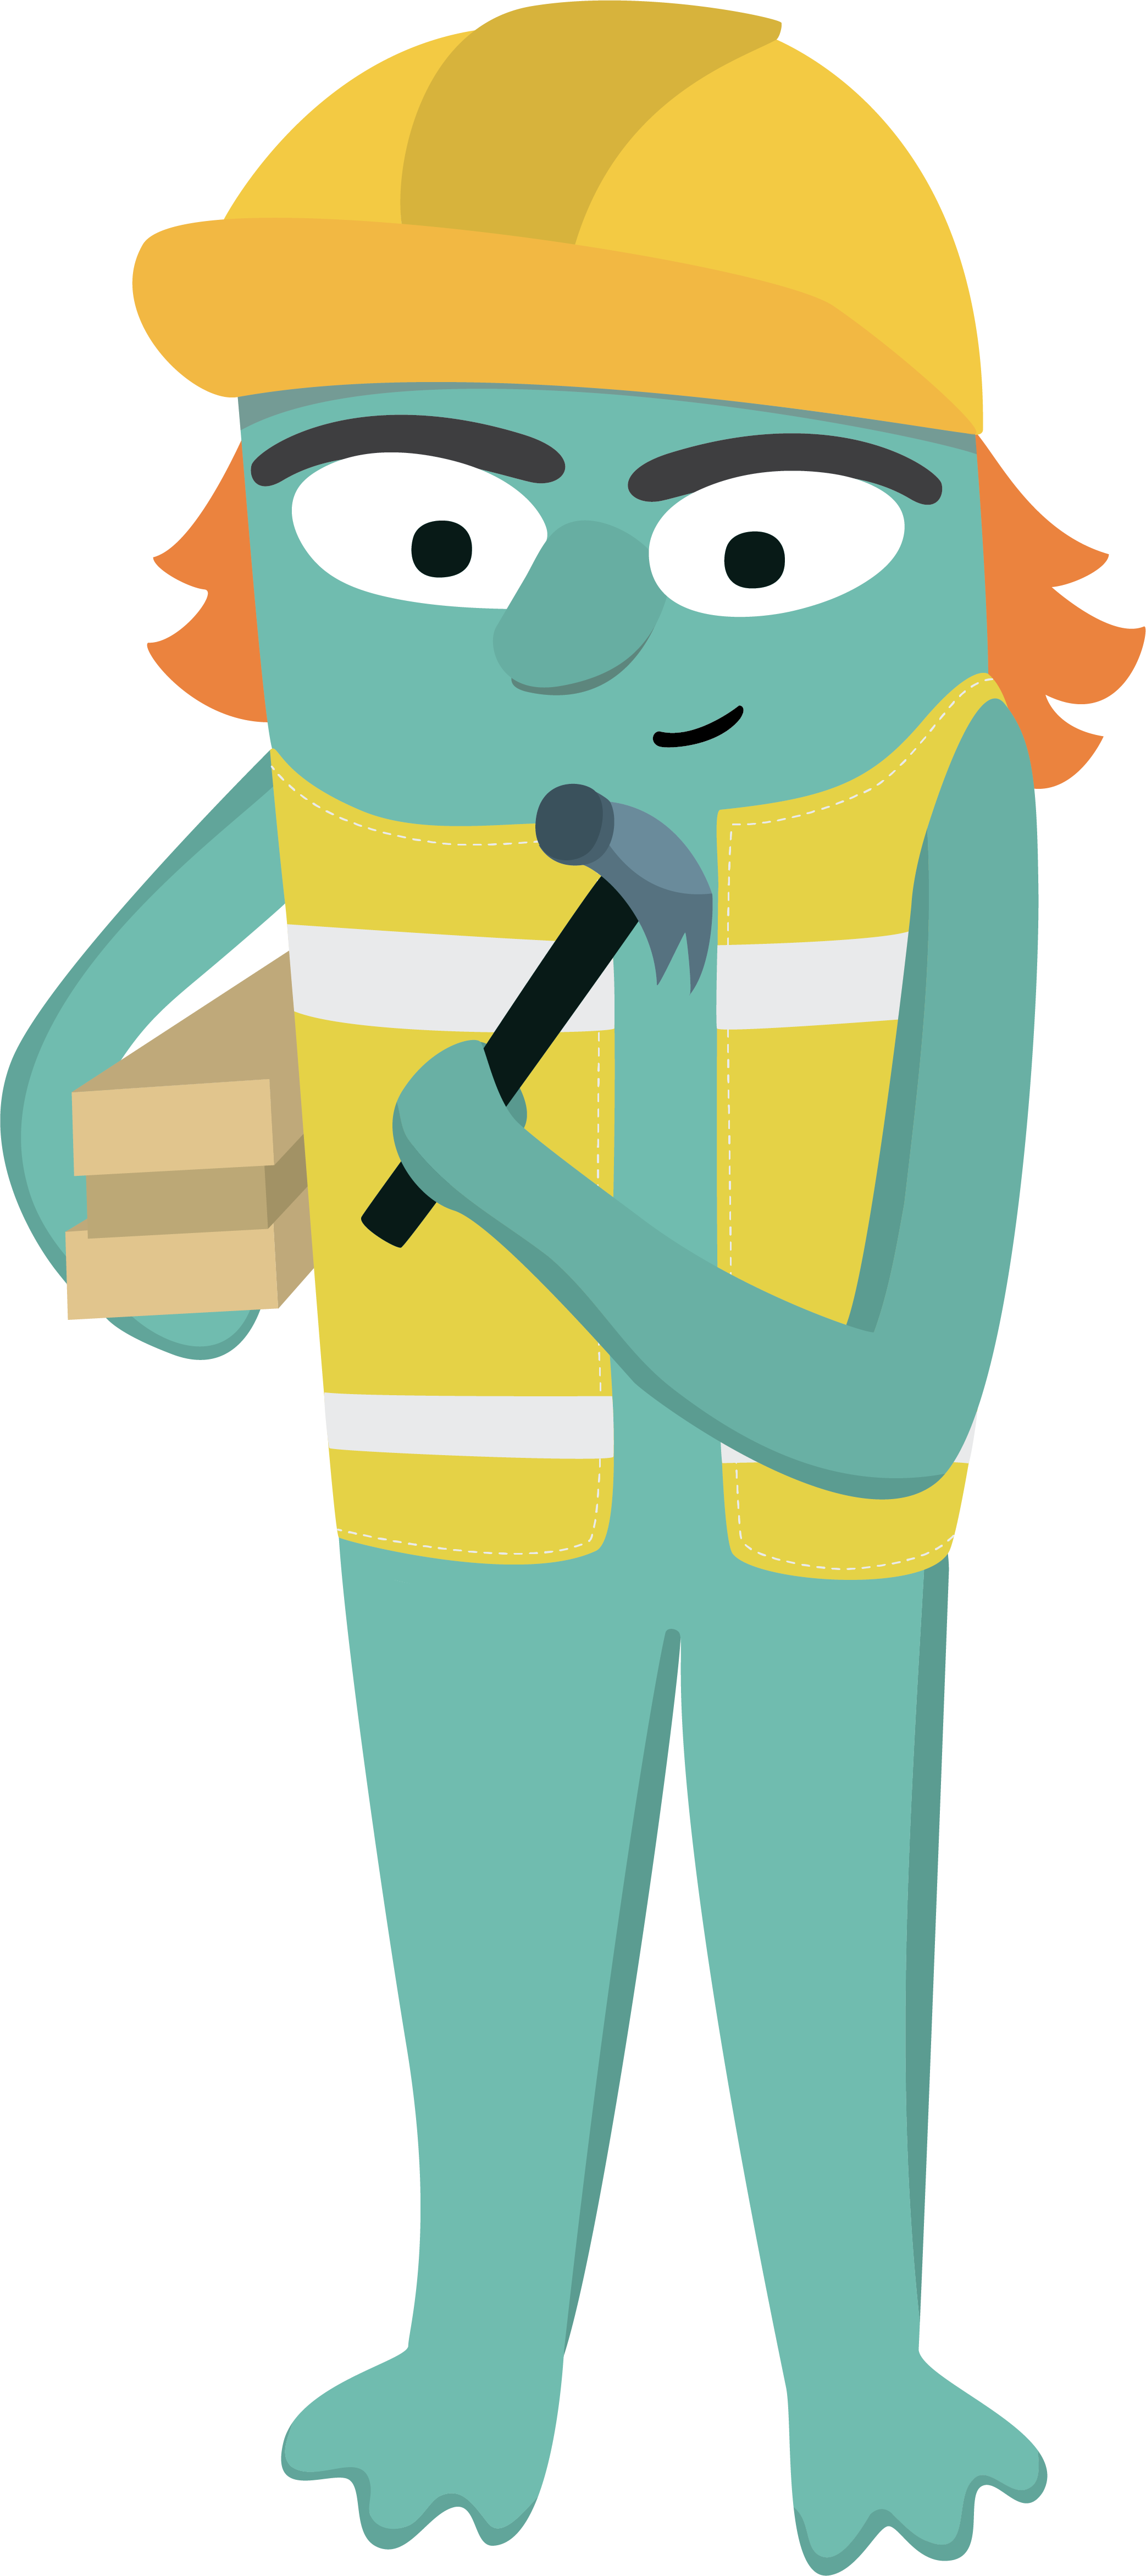 Mascot 1_1.png